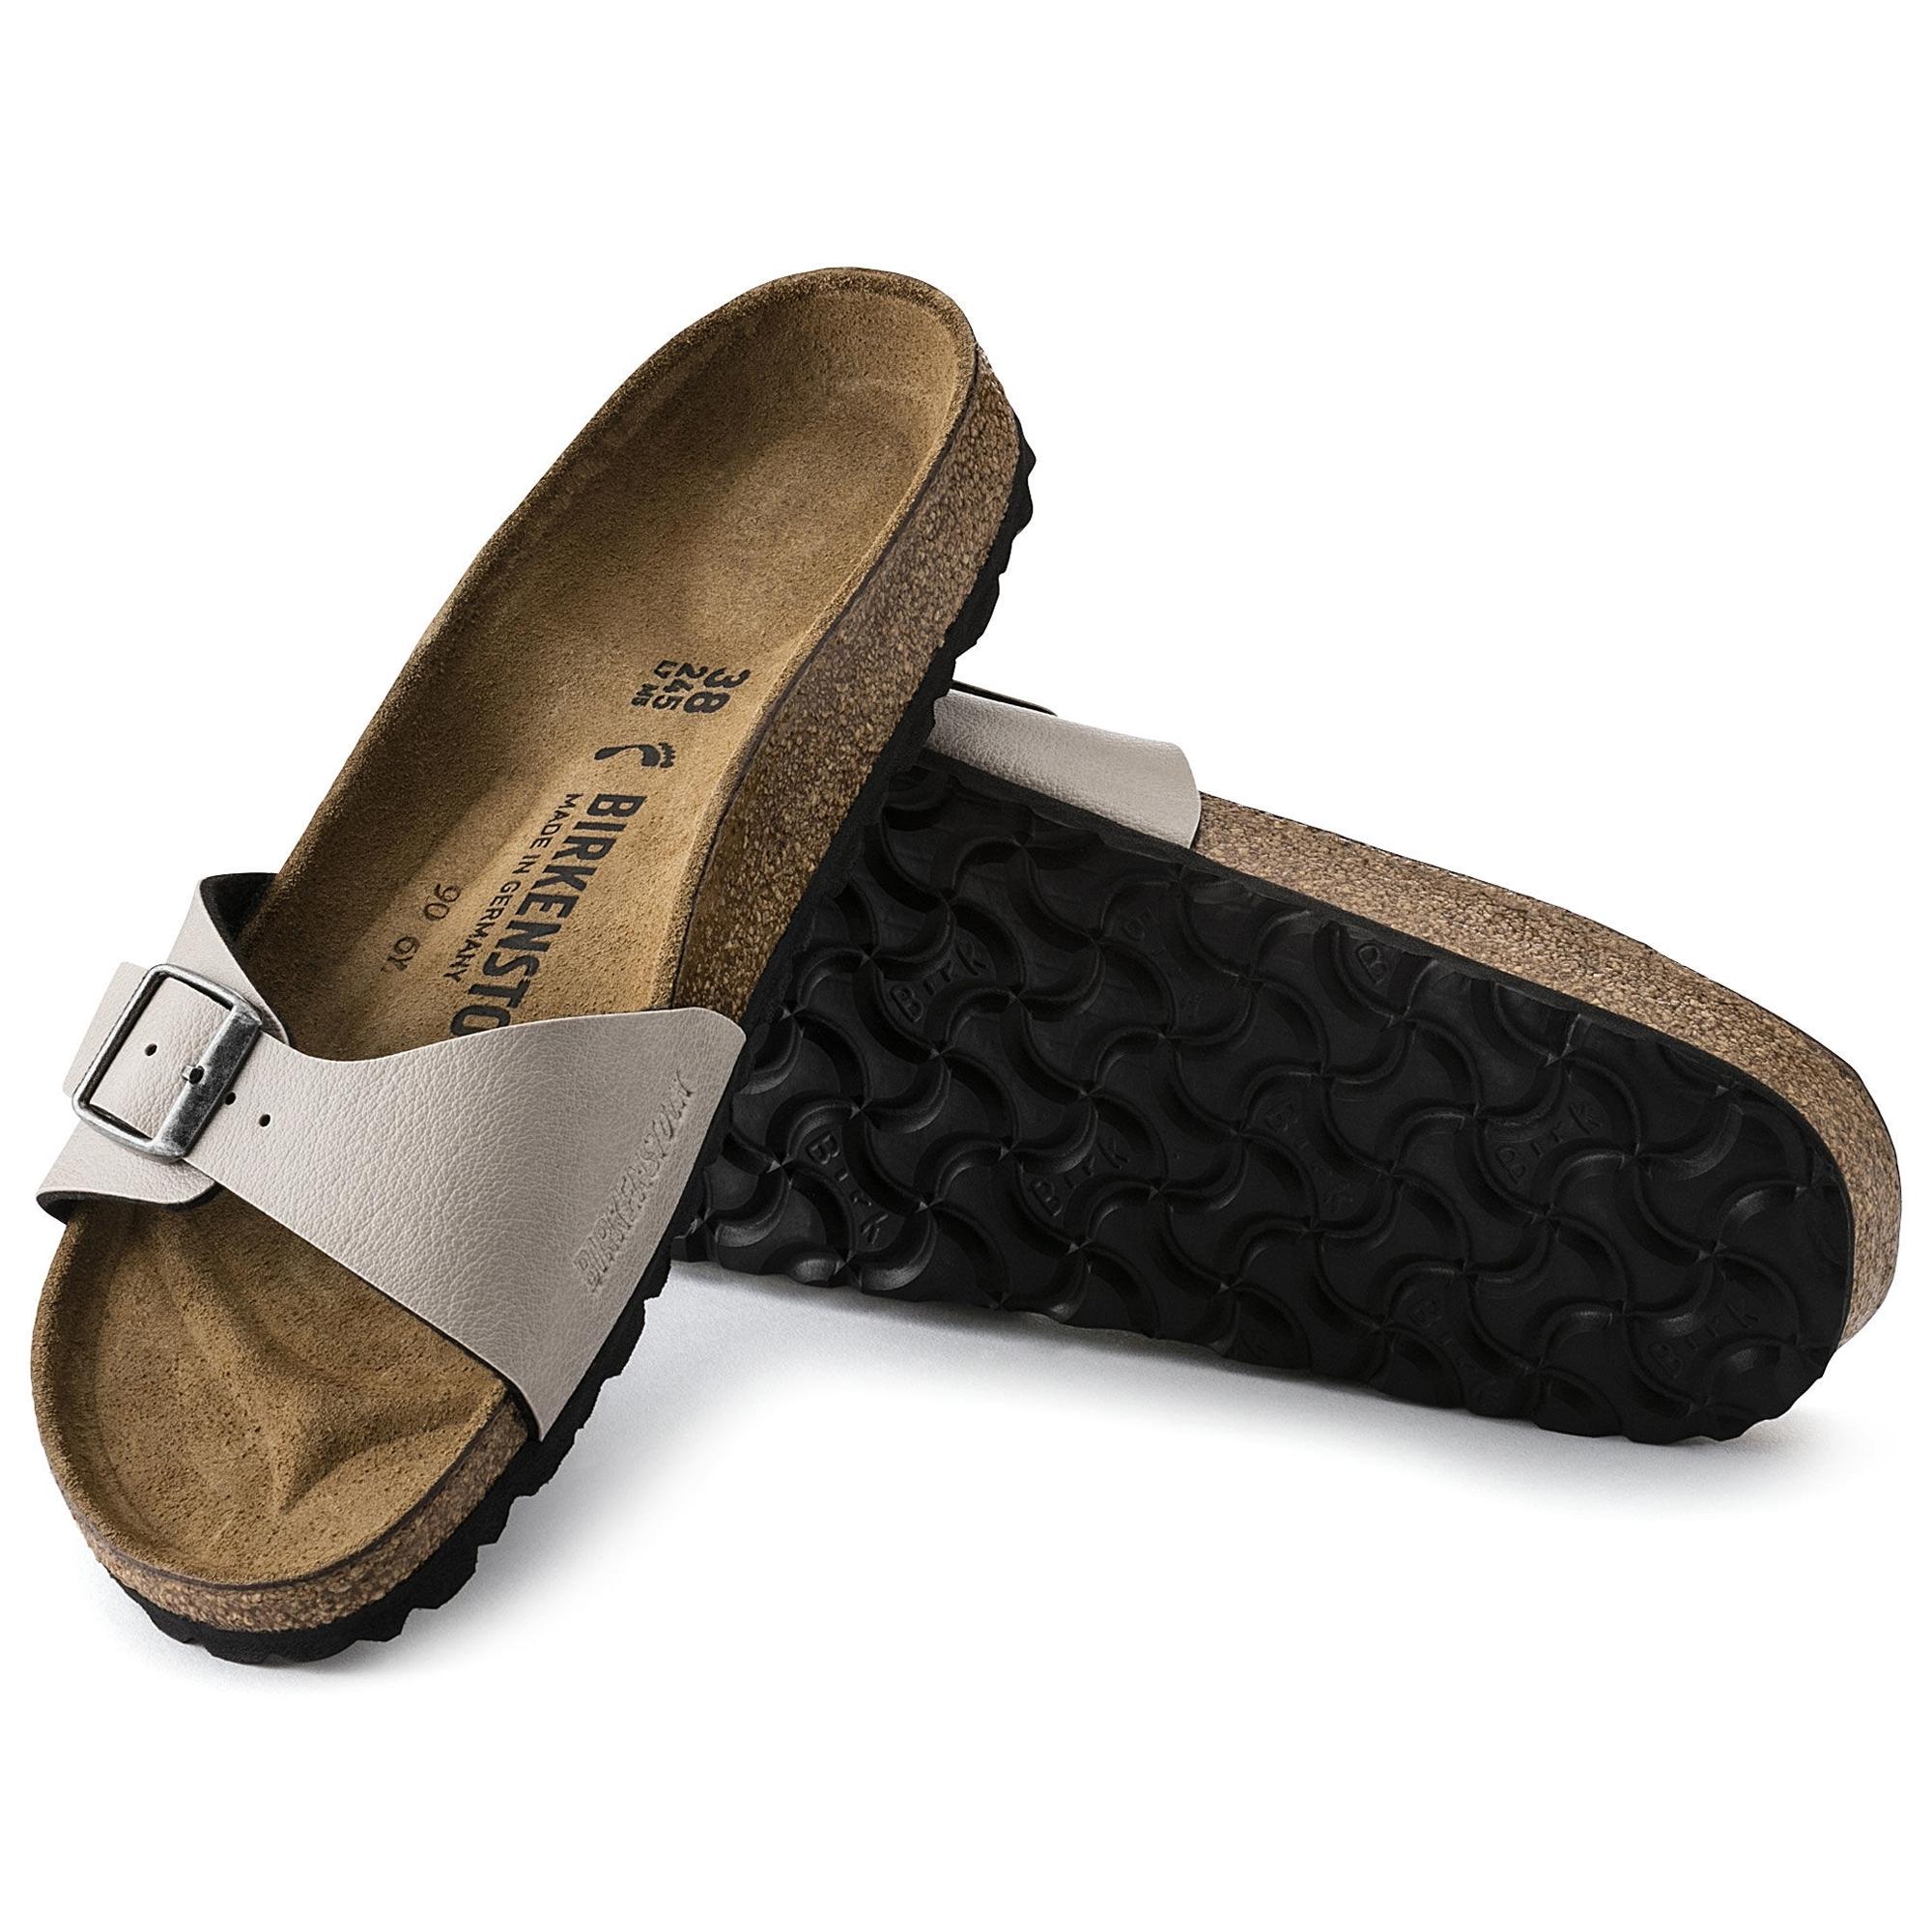 643bc736656f Birkenstock MADRID 1003176 Ladies One Strap Sandals Stone